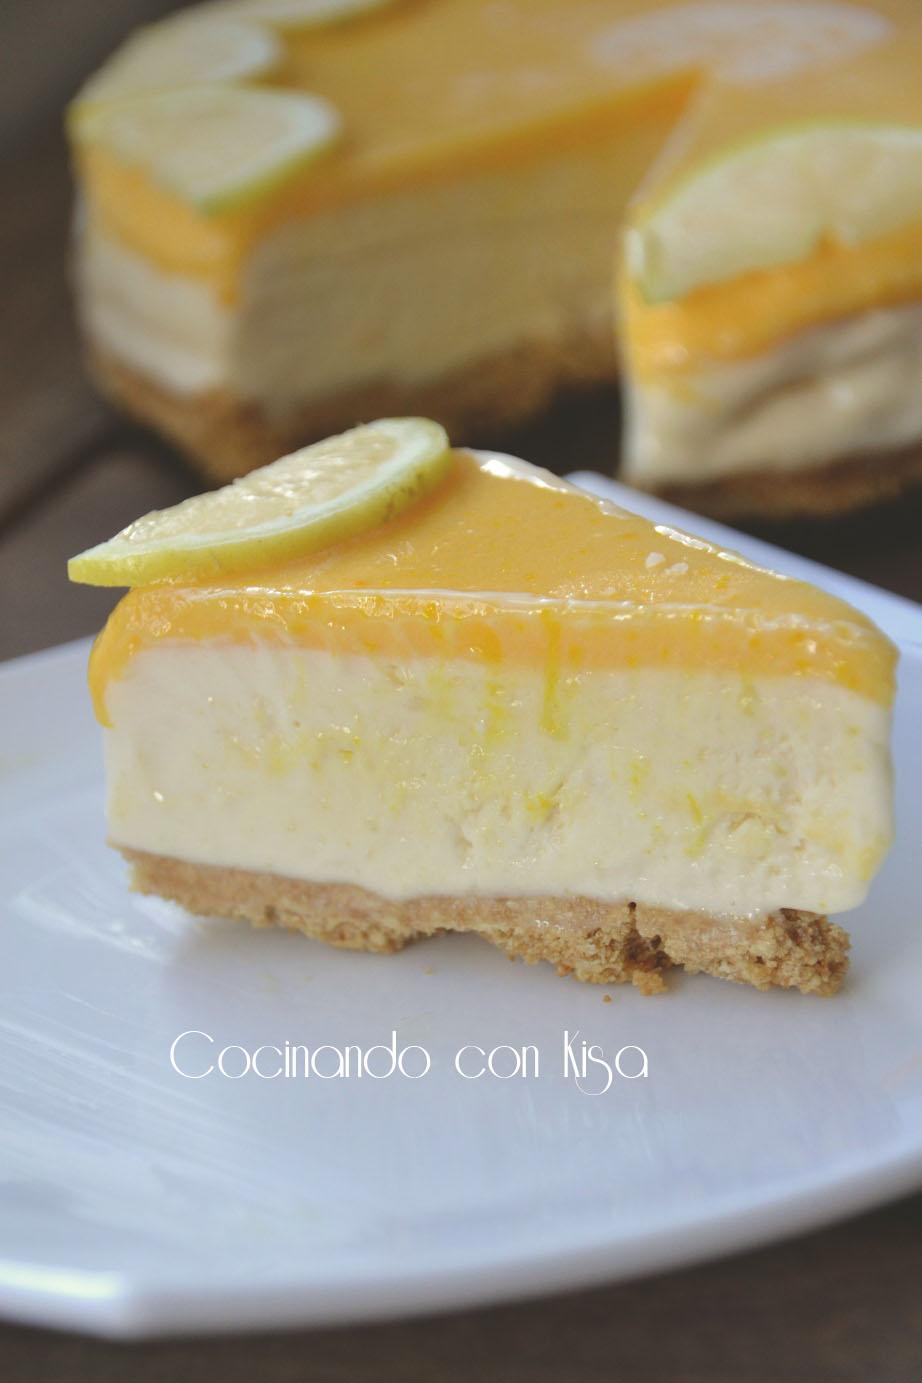 Cocinando con kisa tarta helada de lim n thermomix for Cocinando con kisa